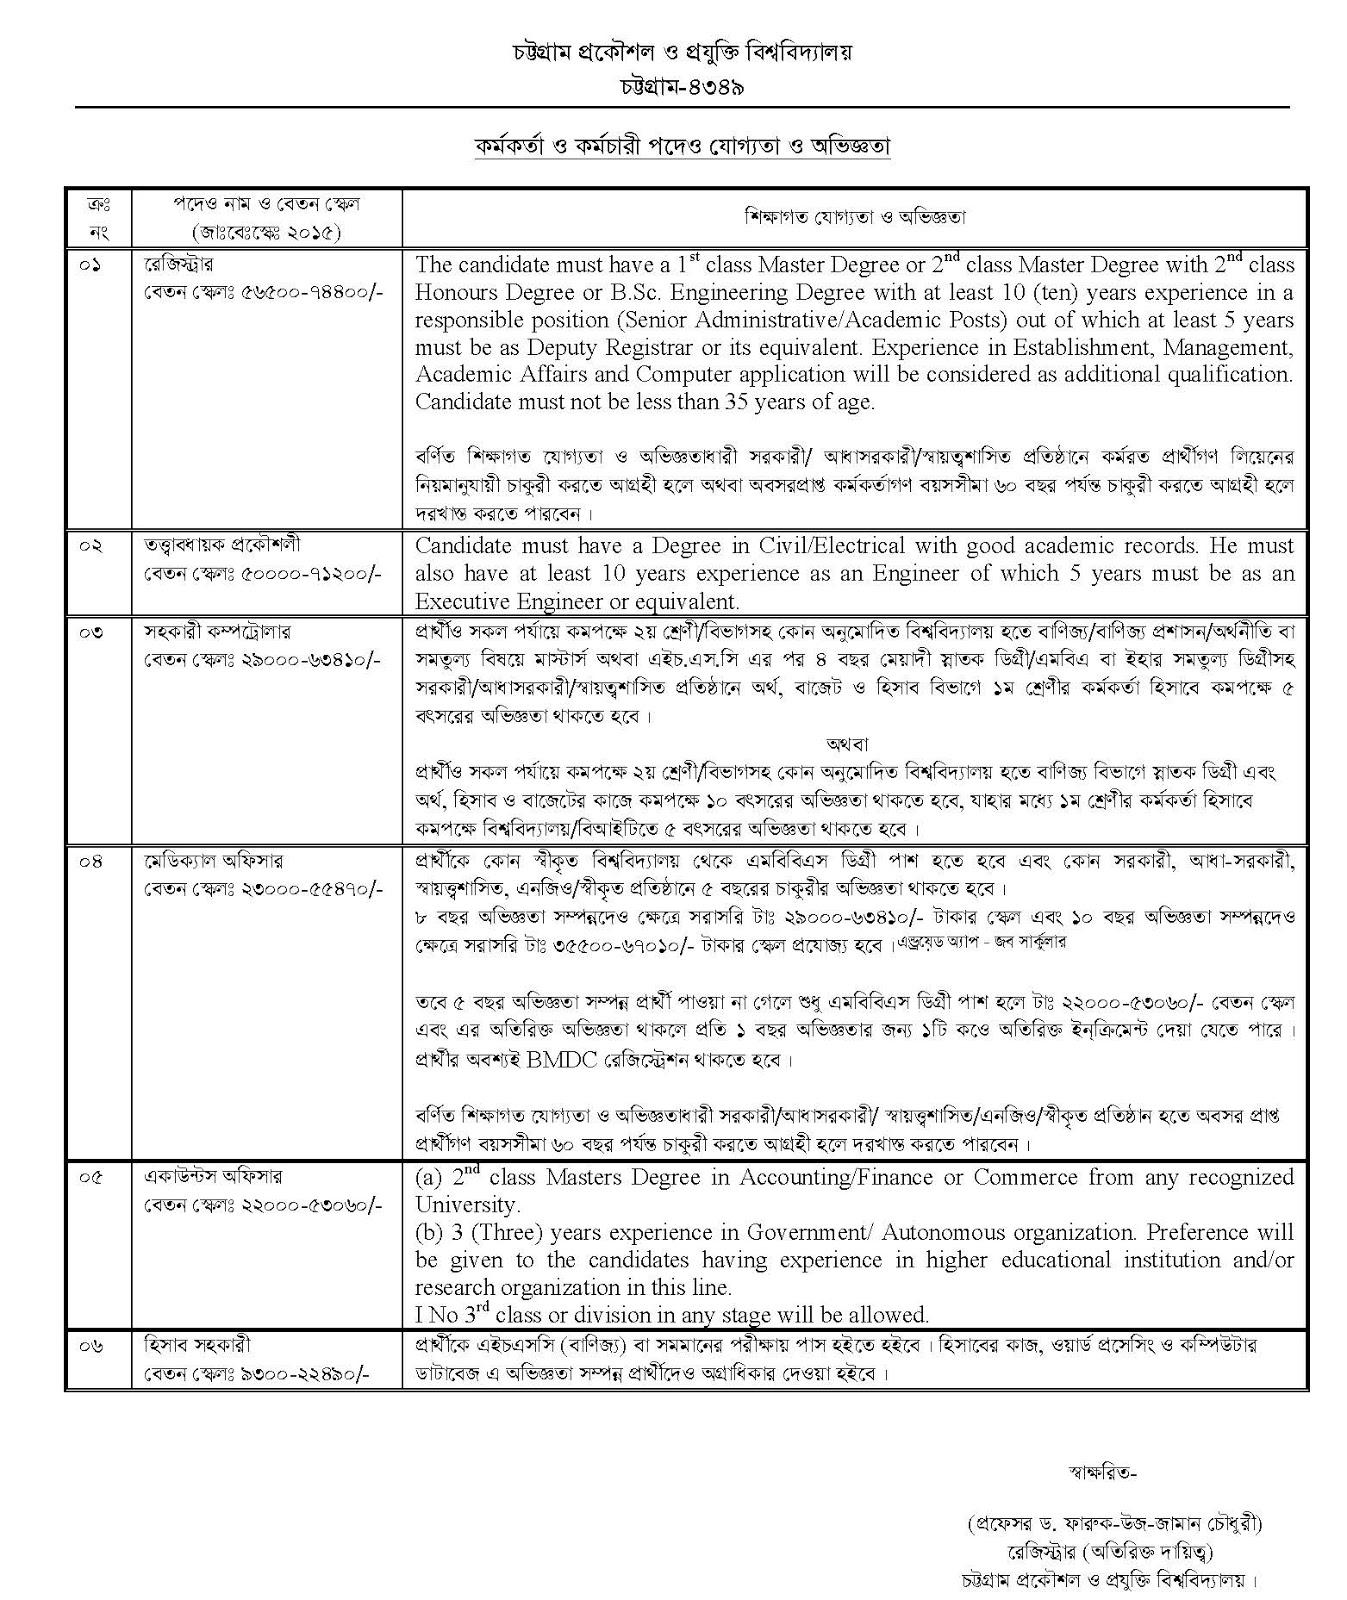 CUET Job Circular 2020 – www.cuet.ac.bd